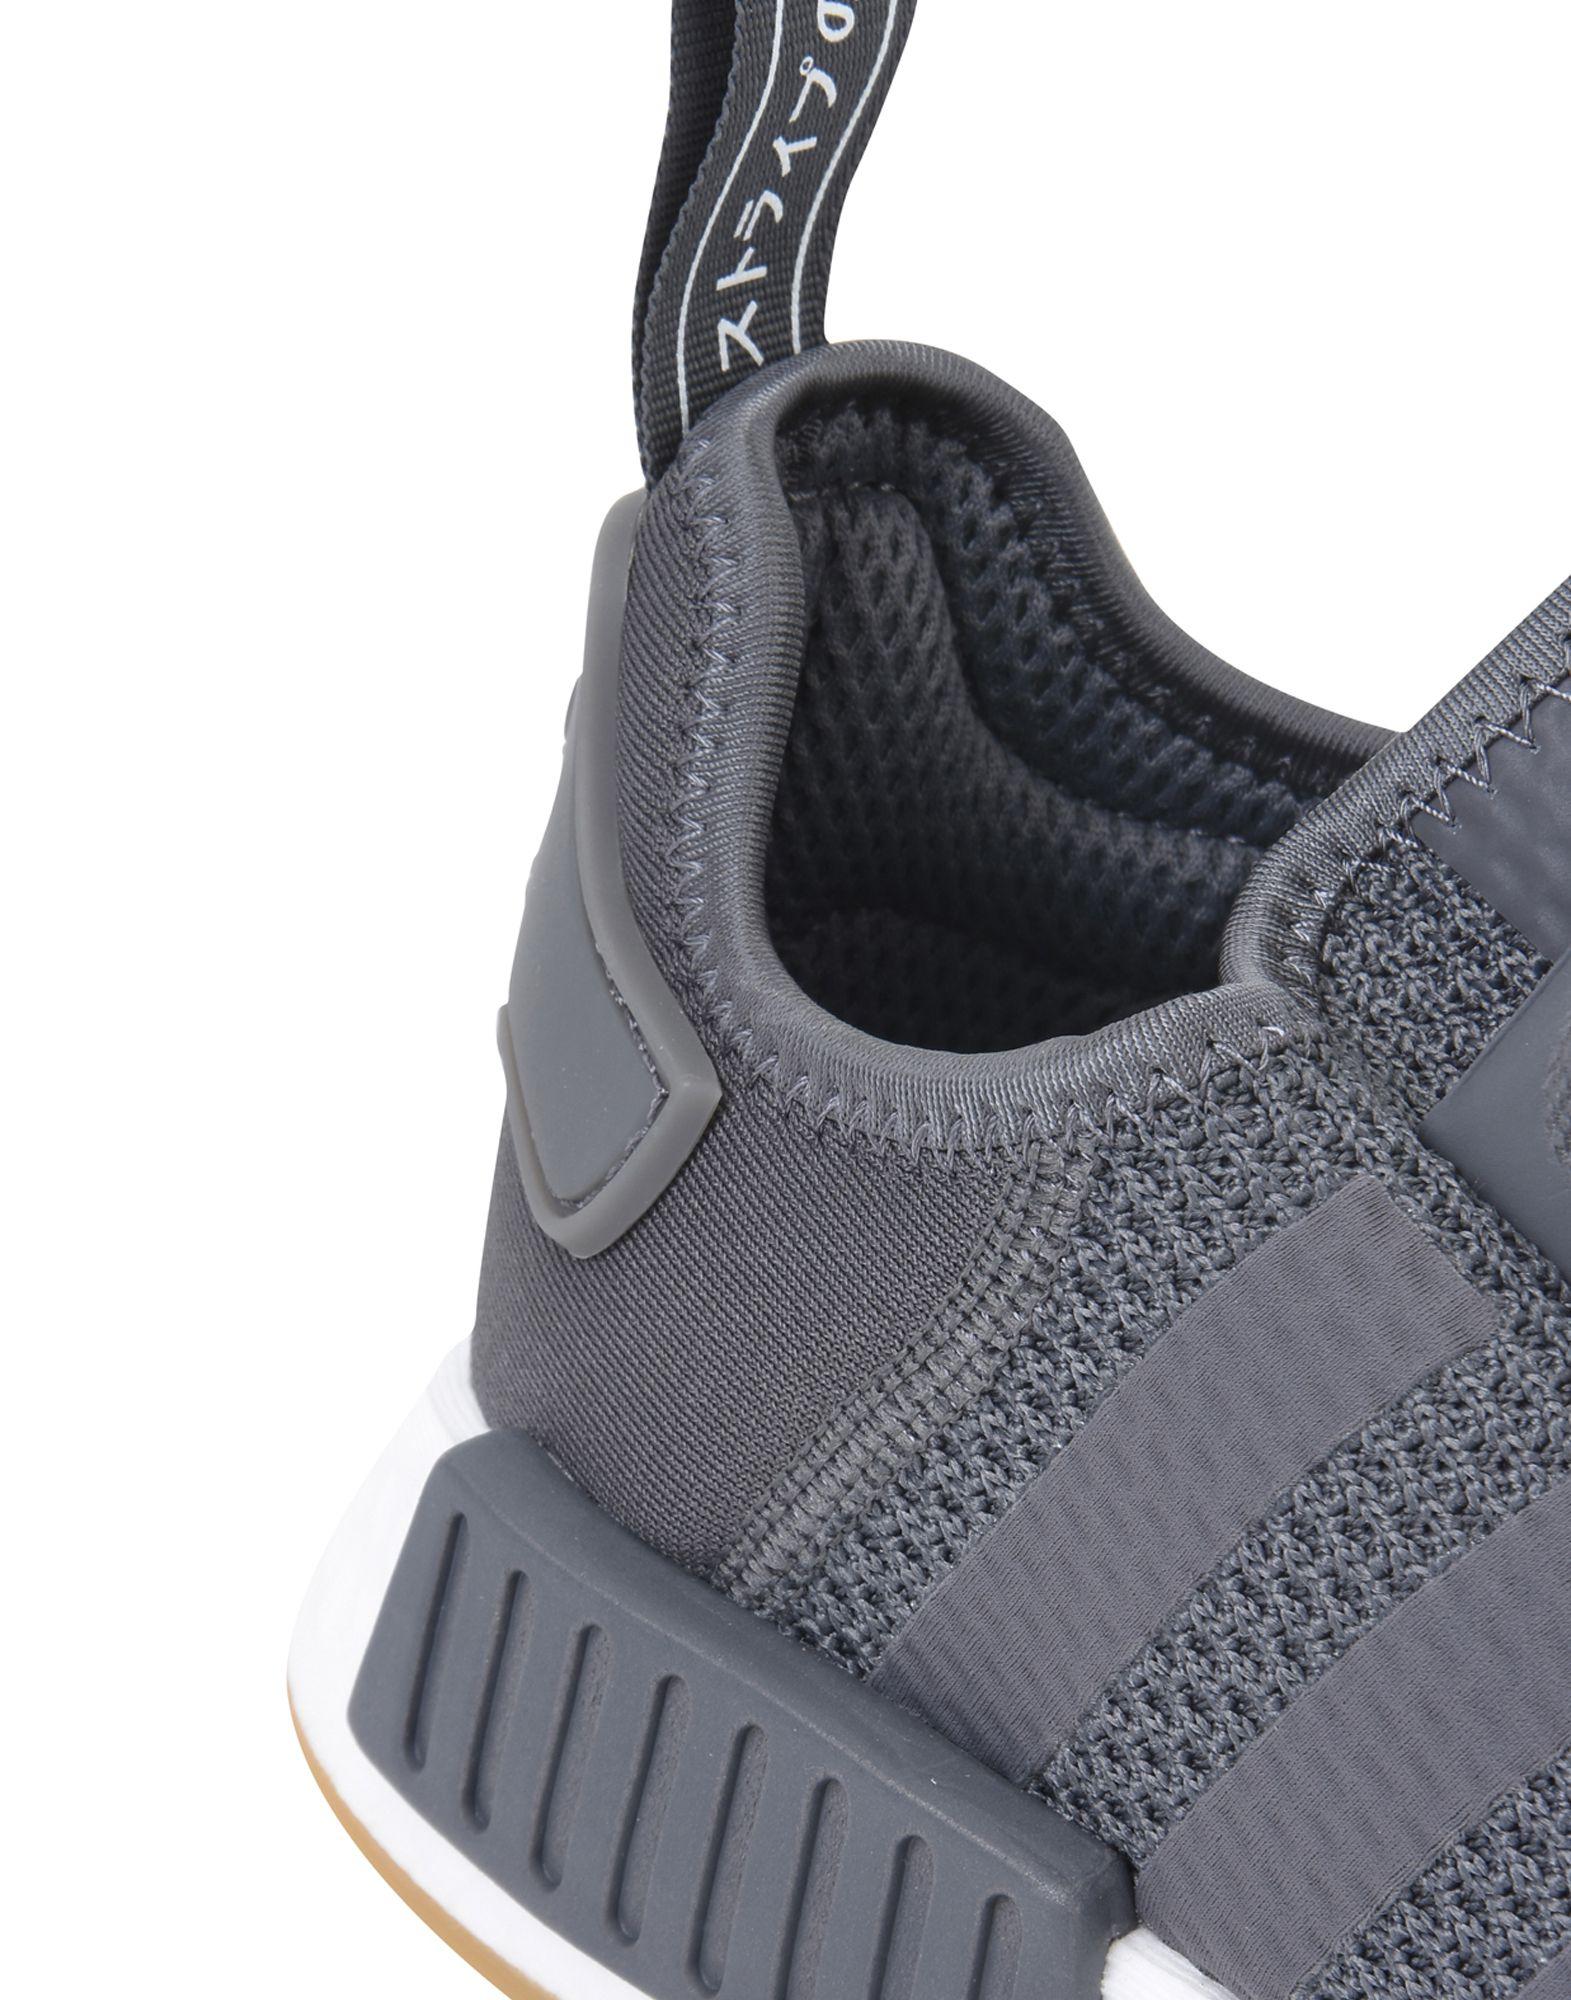 11533561MC Adidas Originals Nmd_R1  11533561MC  Heiße Schuhe 37beaa